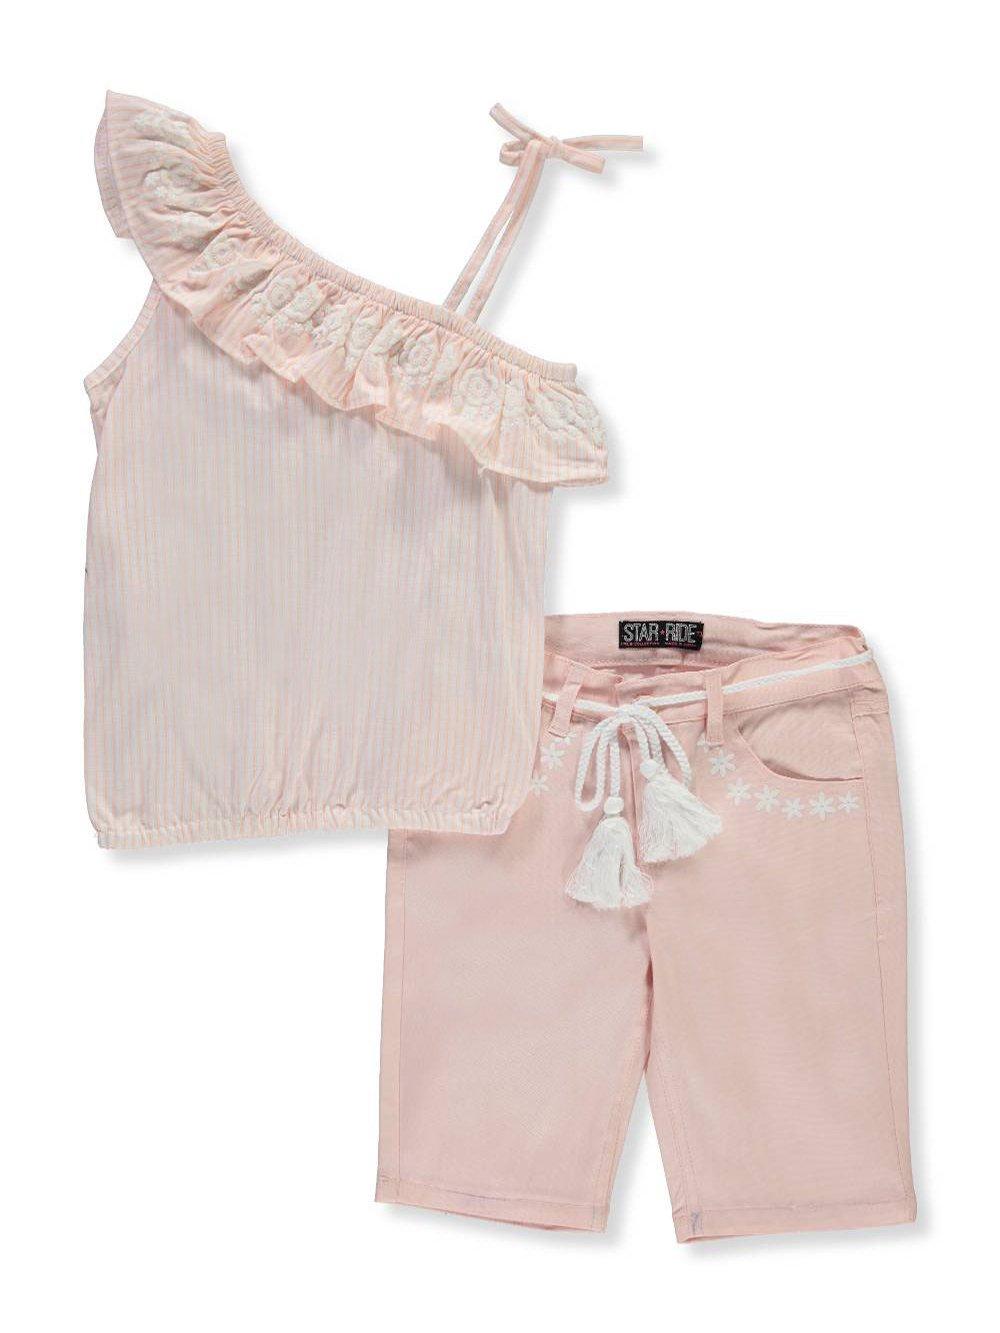 Star Ride Girls' 2-Piece Short Set Outfit